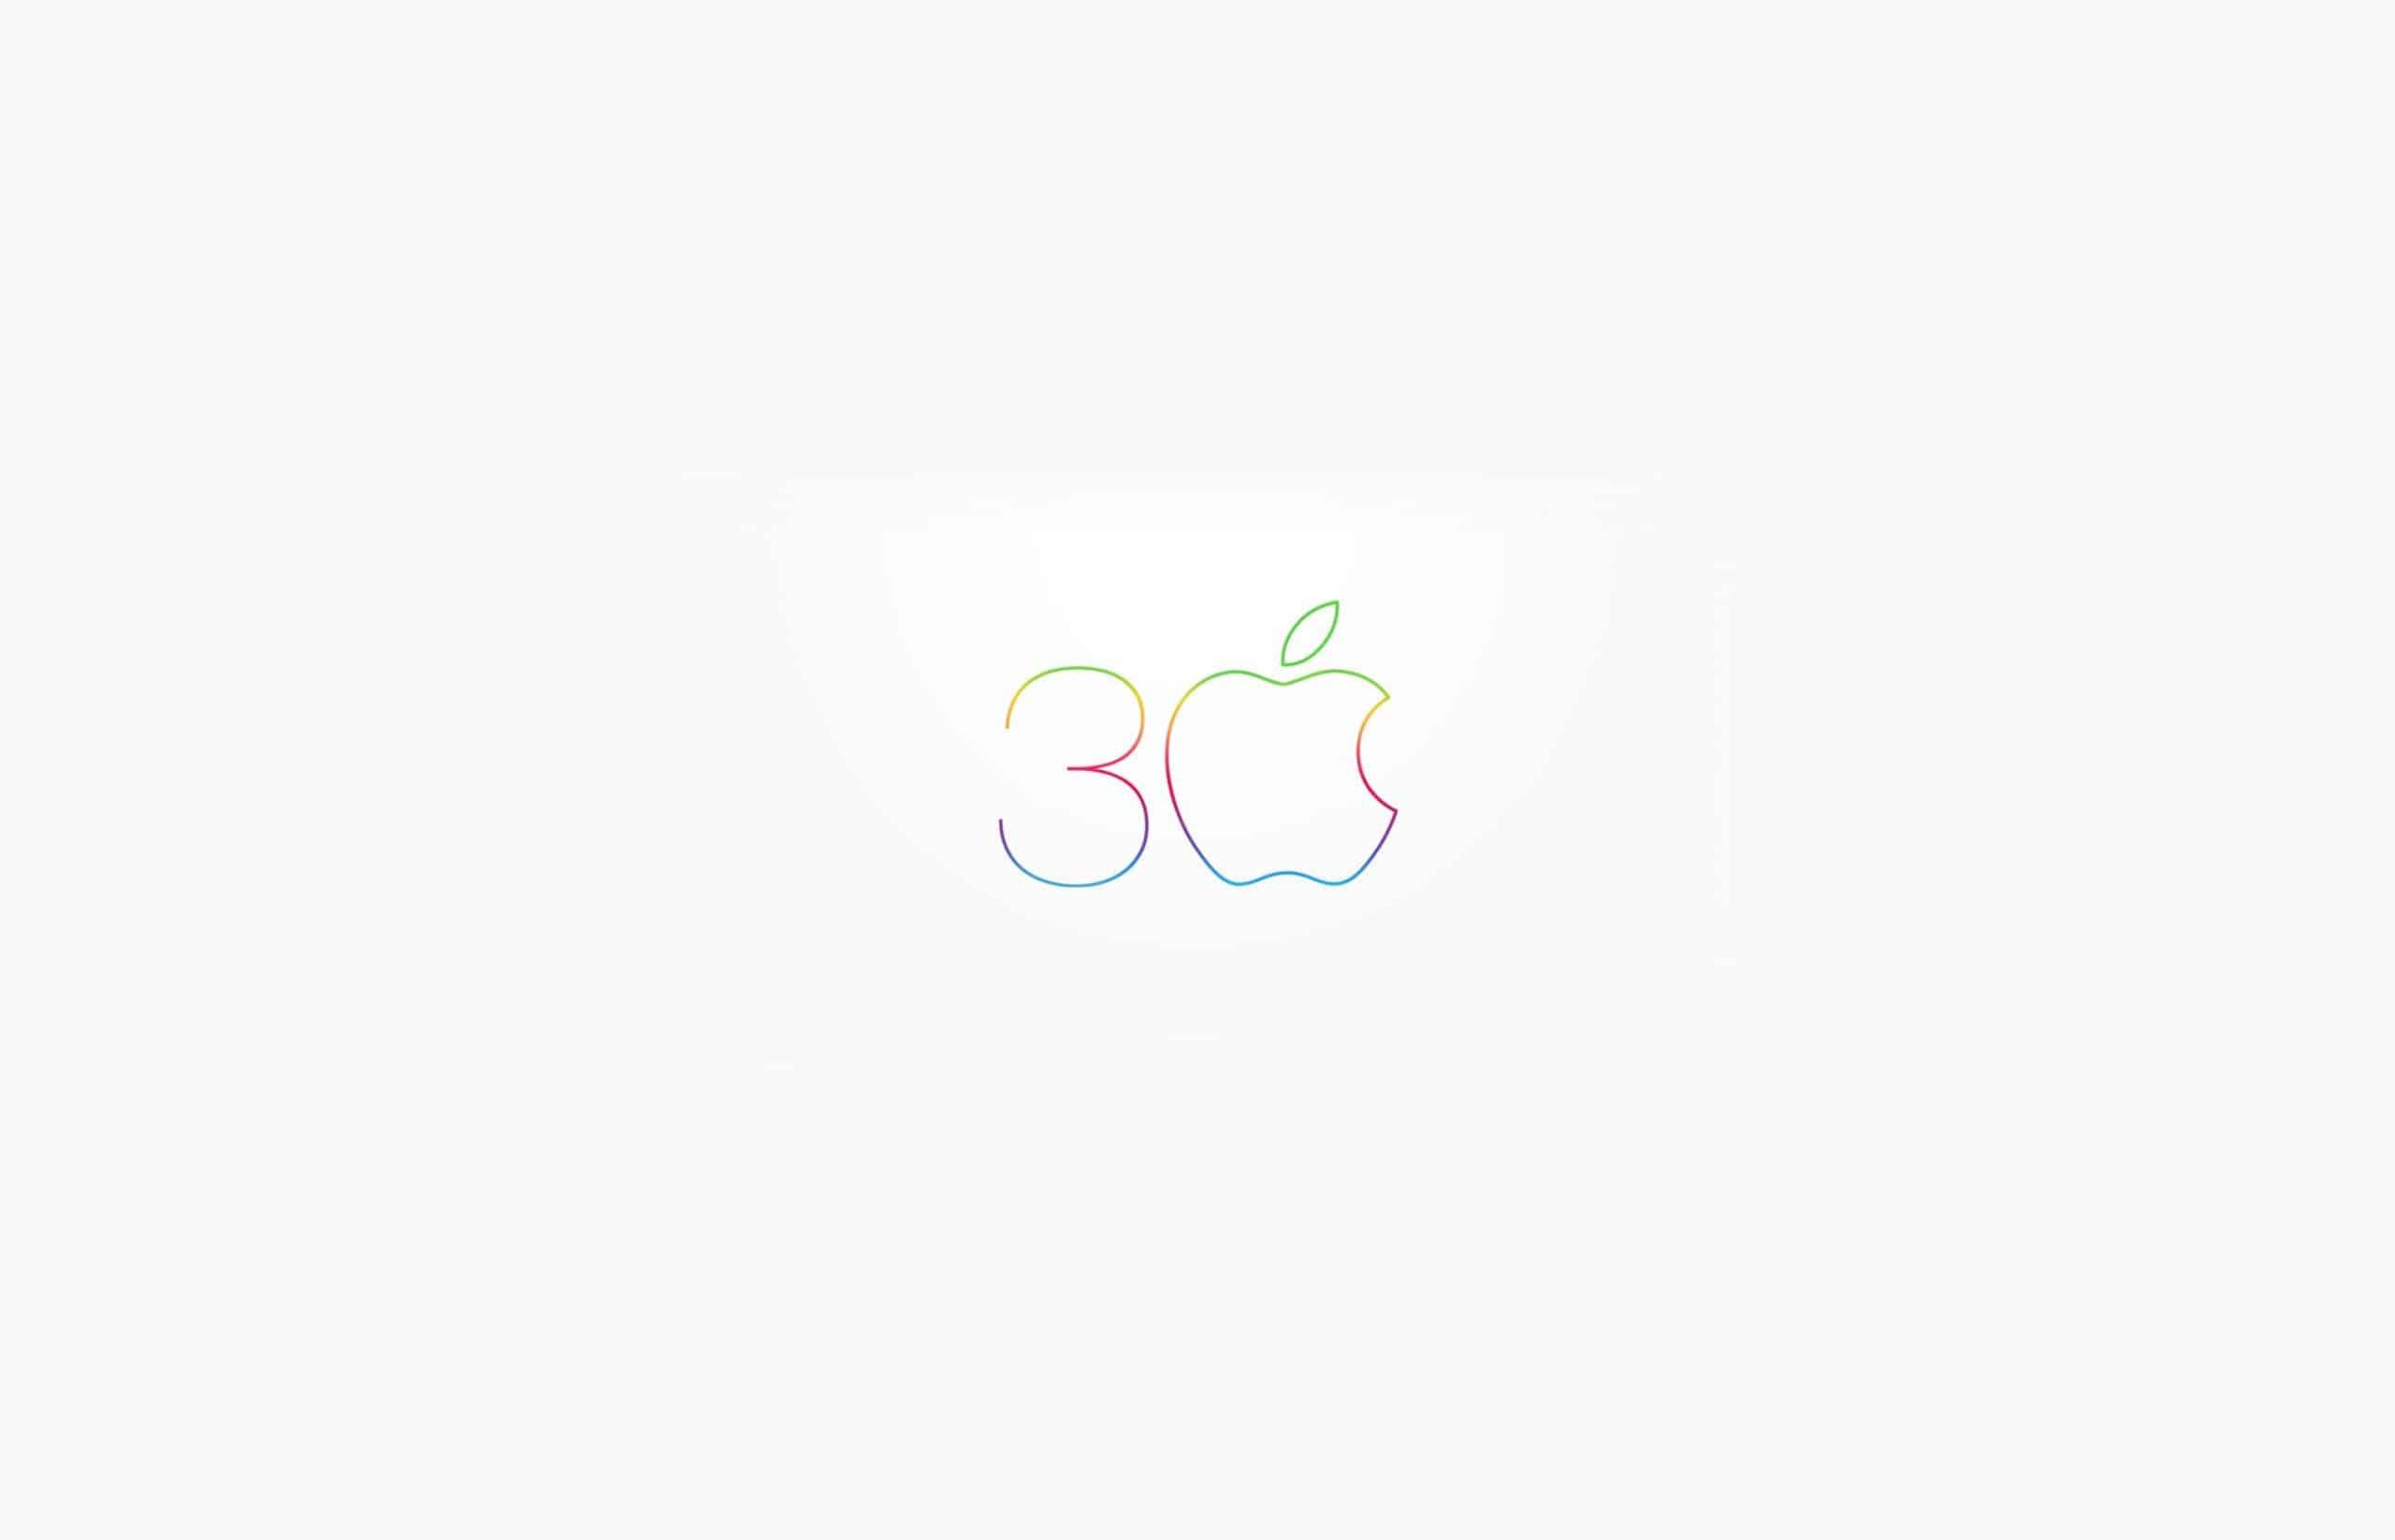 12 Wallpaper 30 aniversario Mac